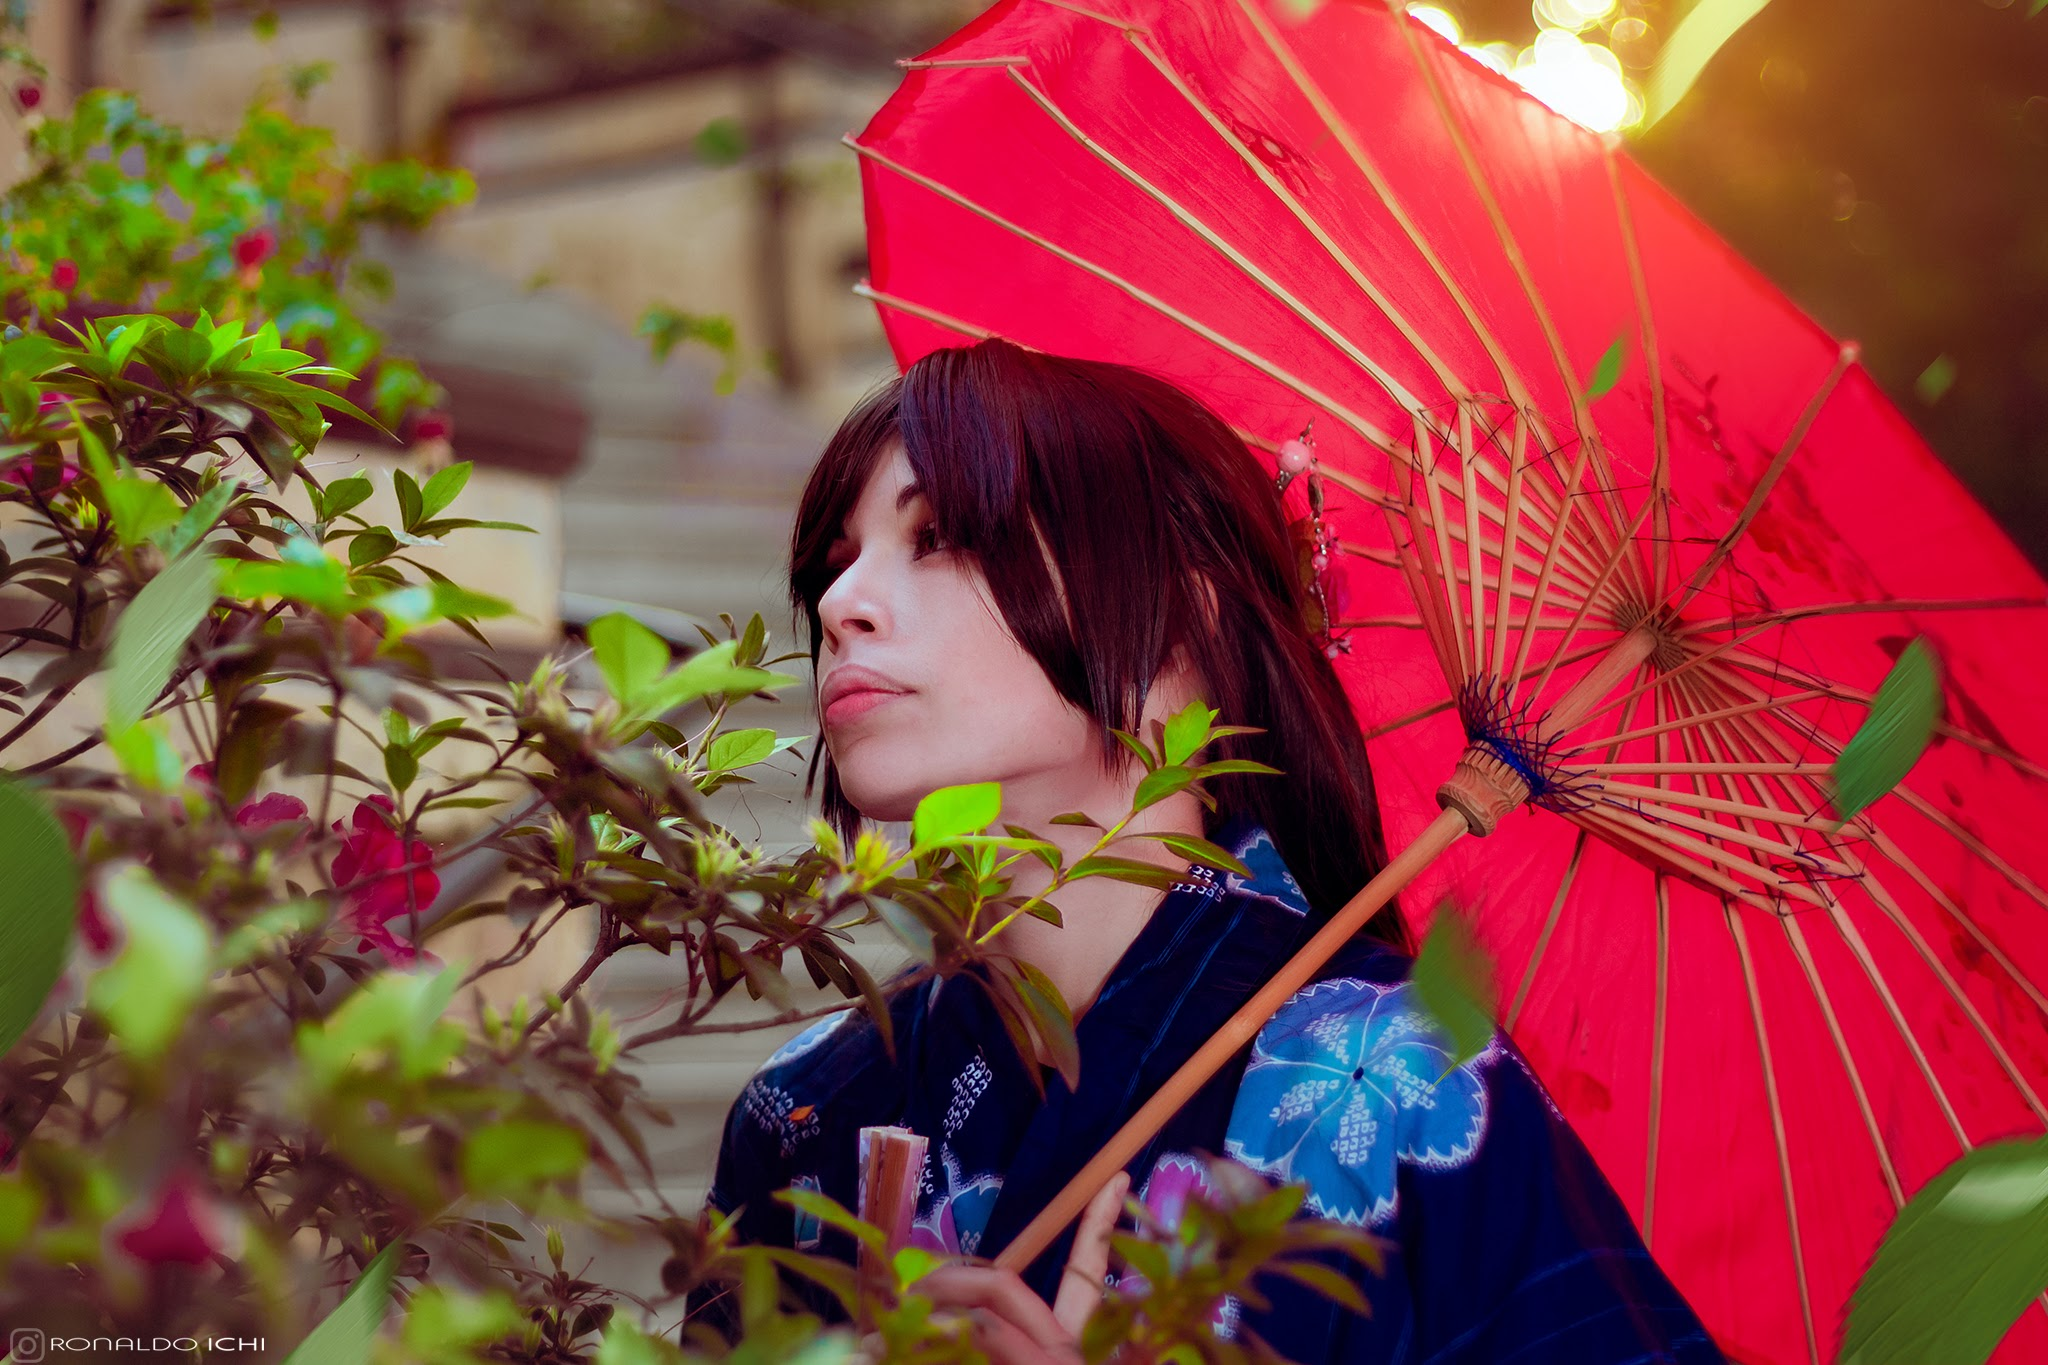 Cosplay - Nanami Momozono and Tomoe from Kamisama hajimemashita - photographer Ronaldo Ichi